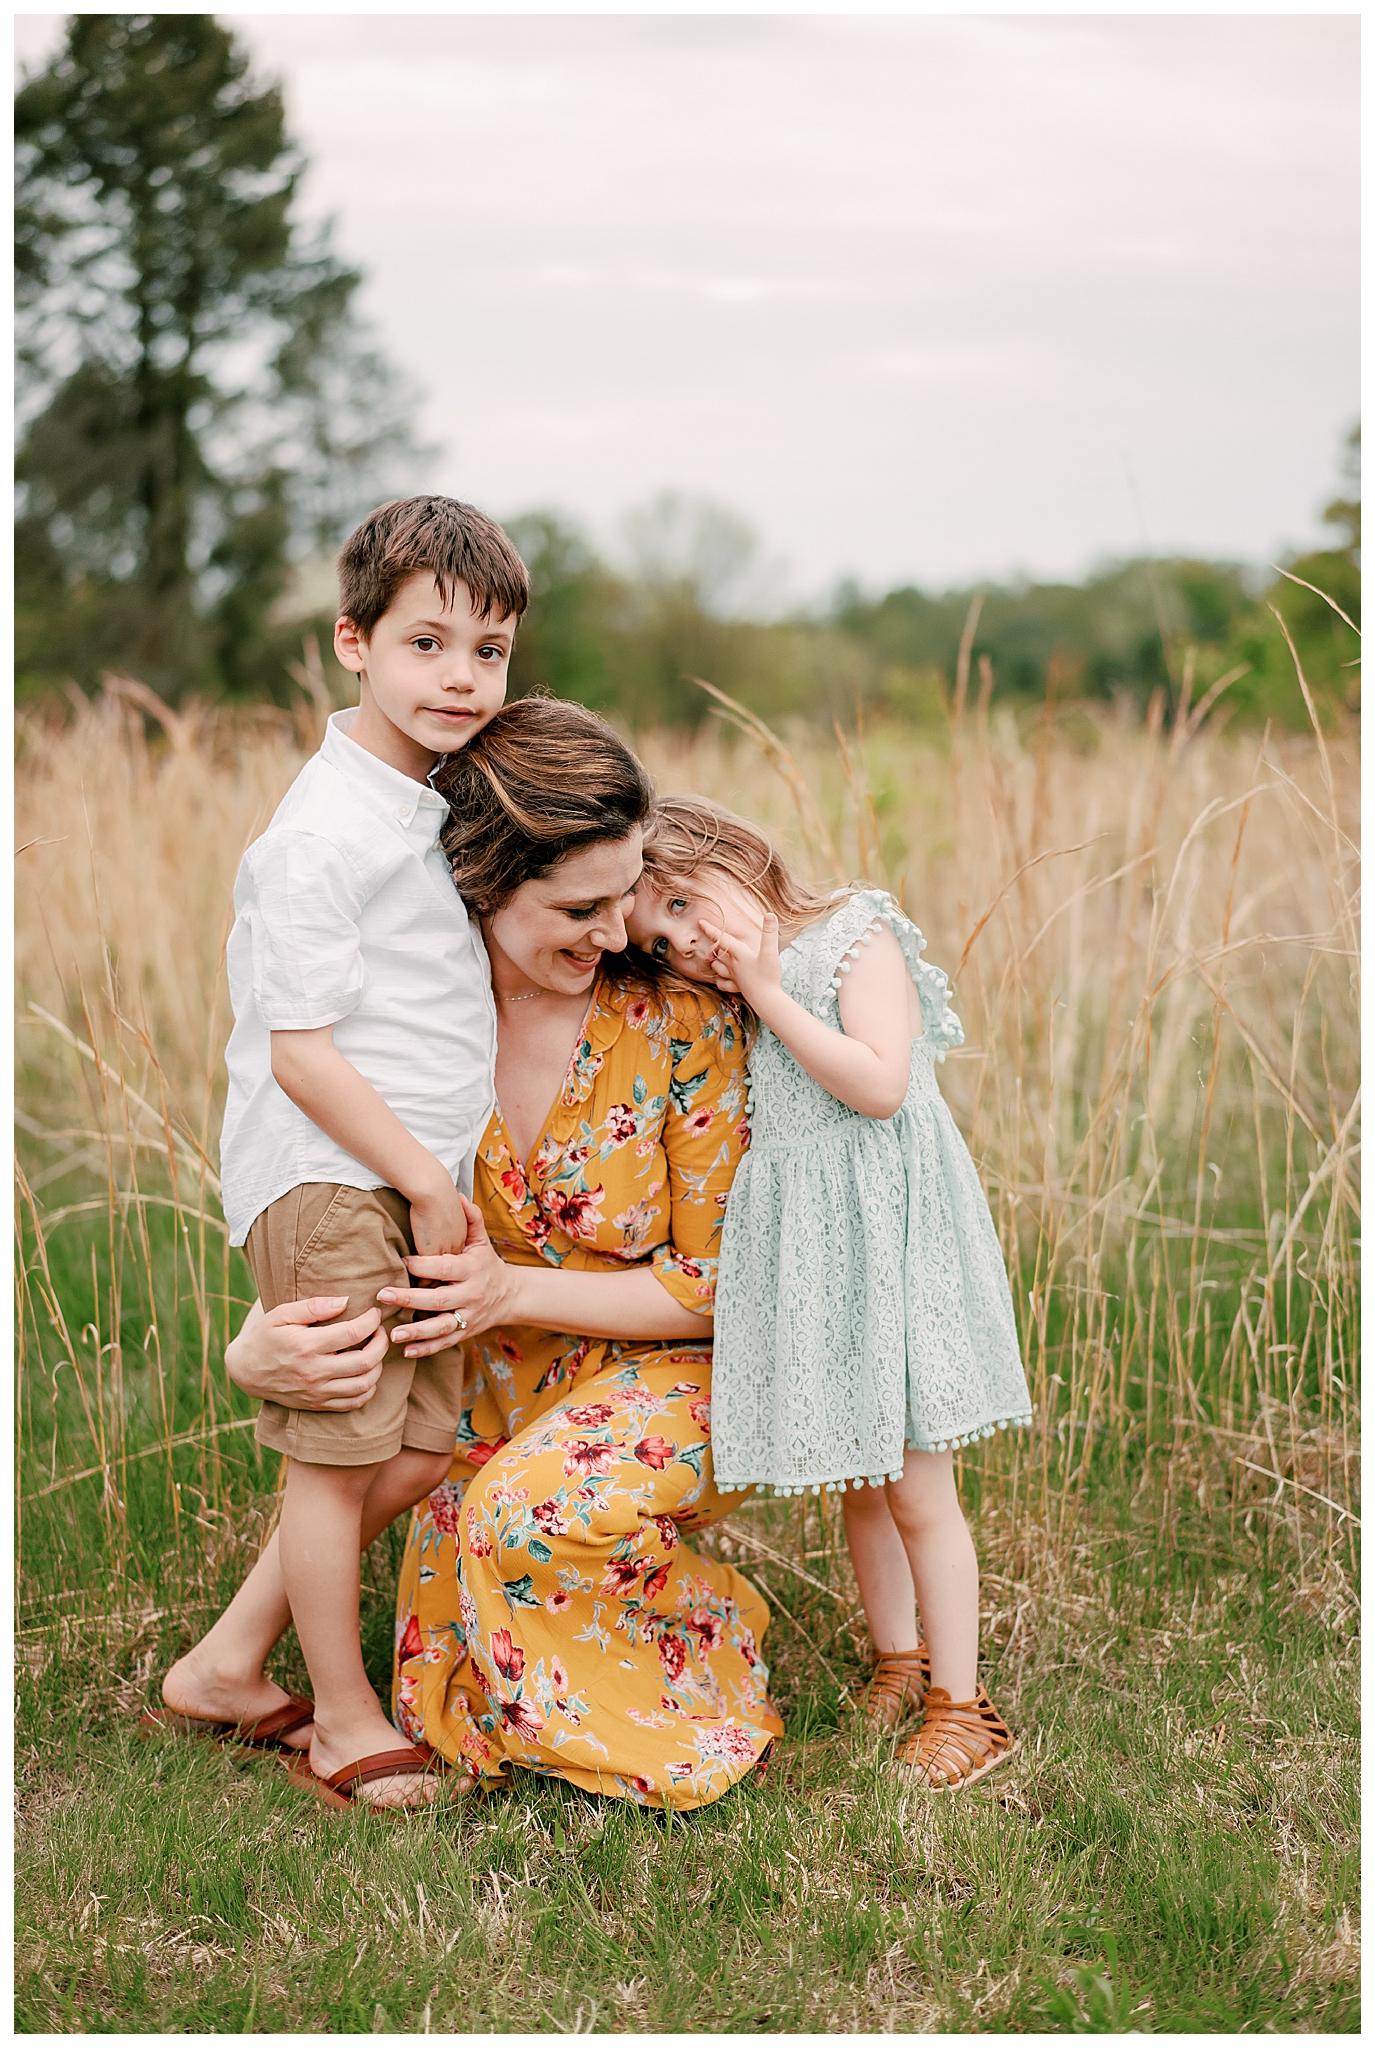 AnneMarie_Hamant_family_photographer_lehigh_valley_pa_0263.jpg